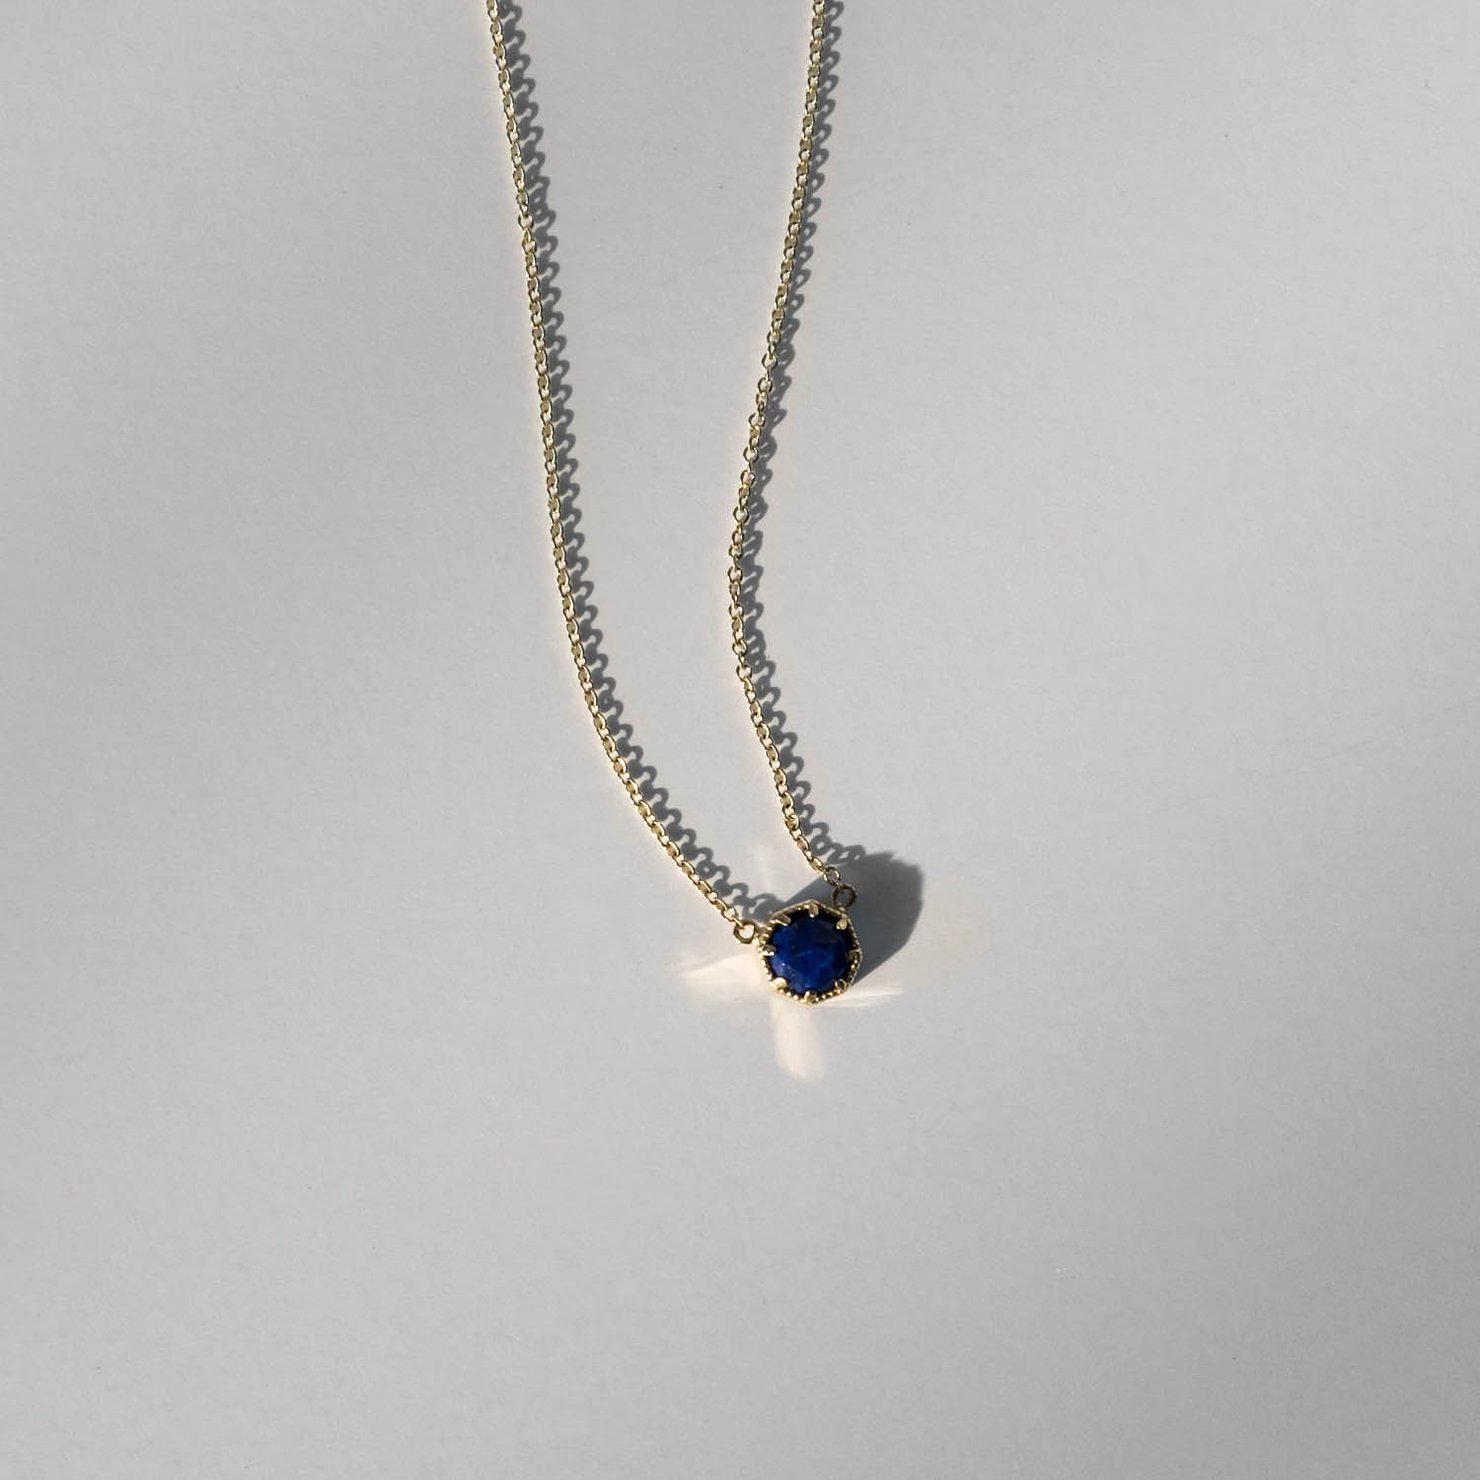 blue round pendant necklace